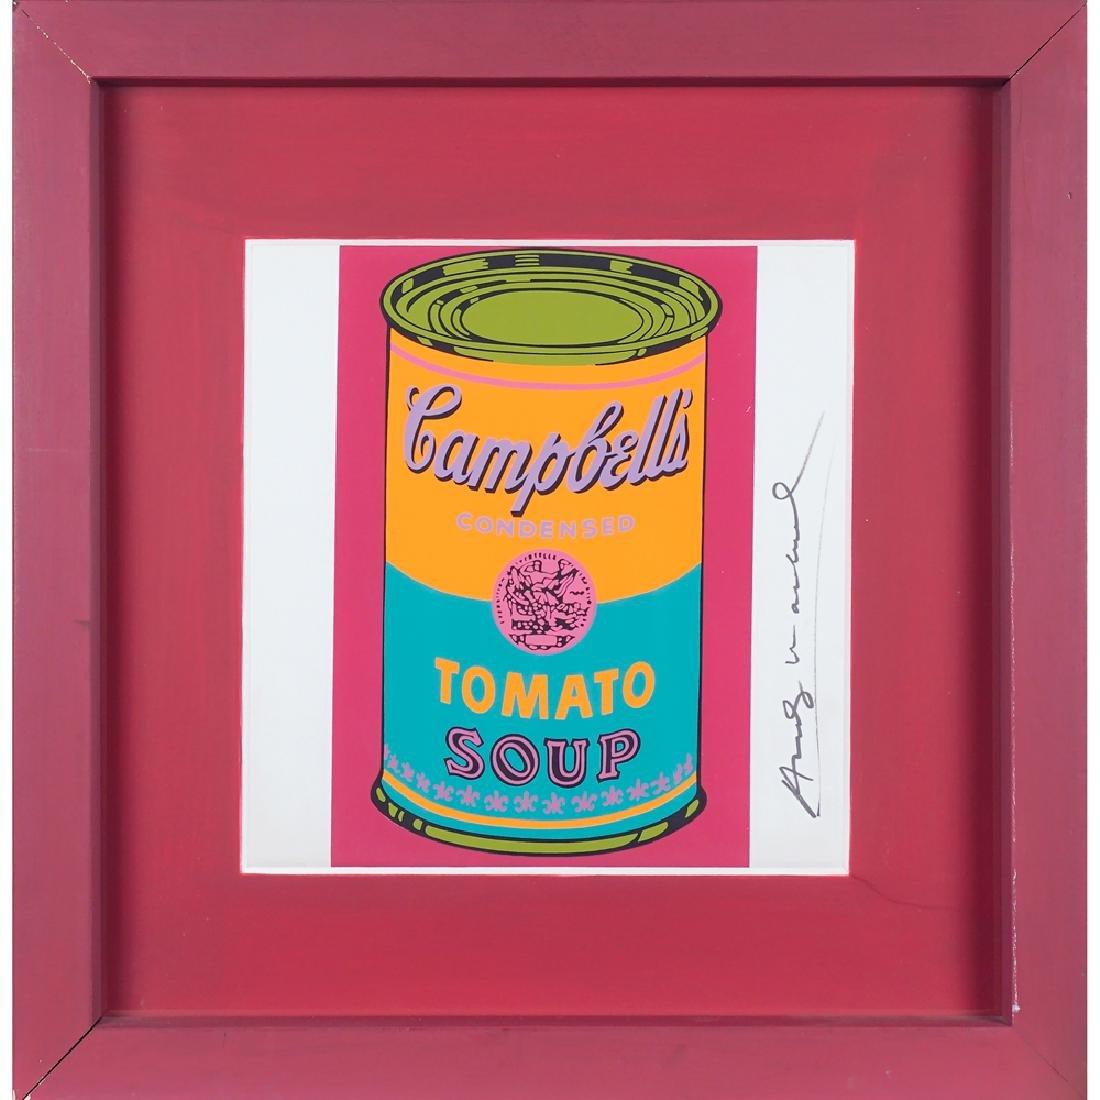 Andy Warhol Pittsburgh 1928 1928 - New York 1987 38